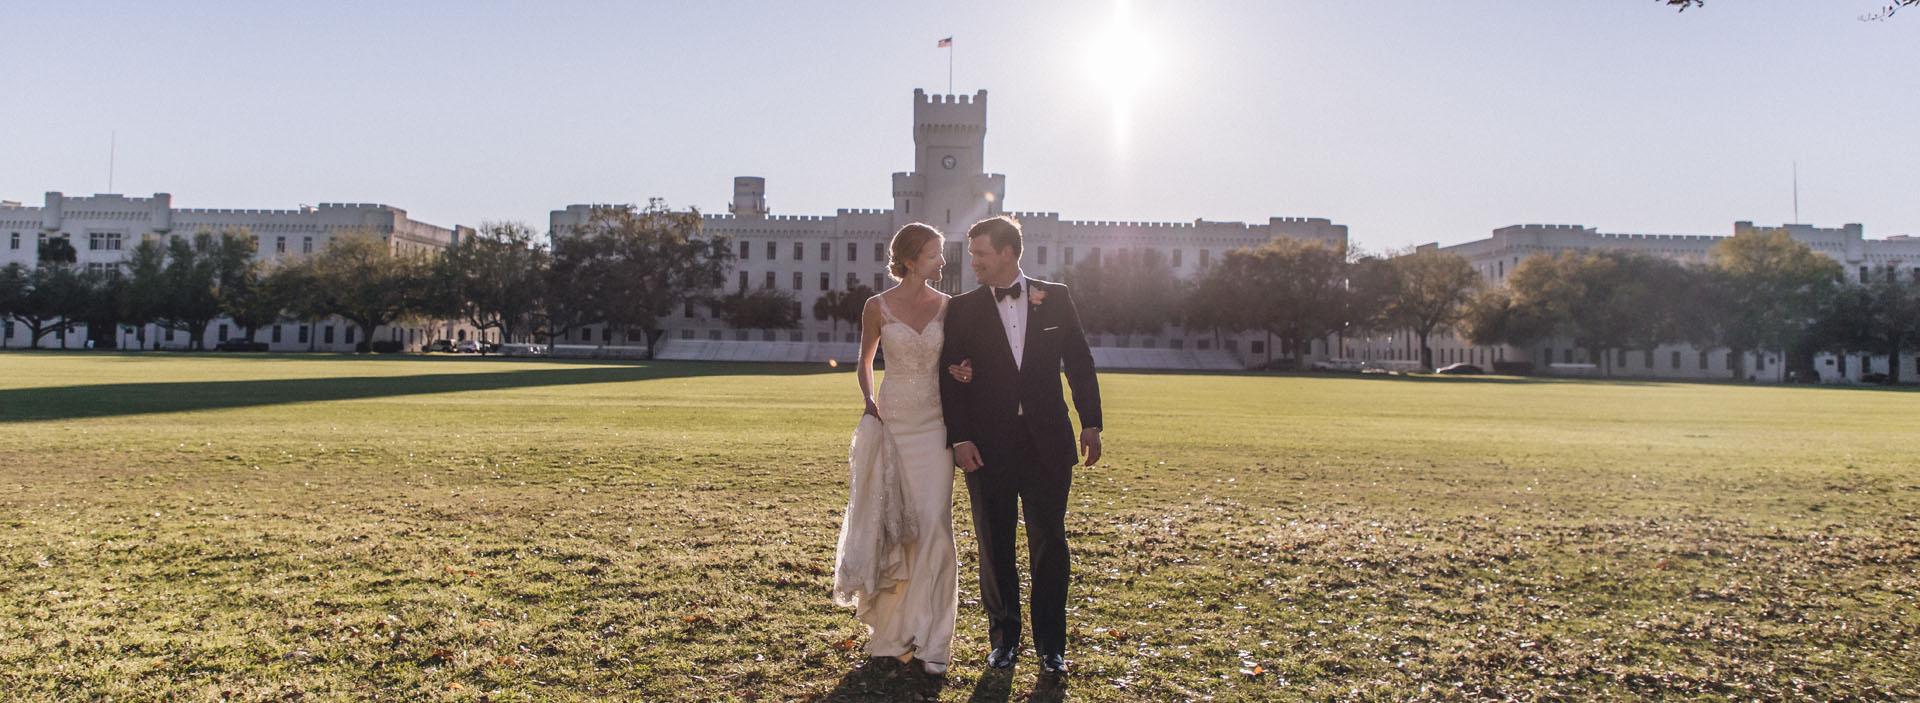 03 Citadel Wedding